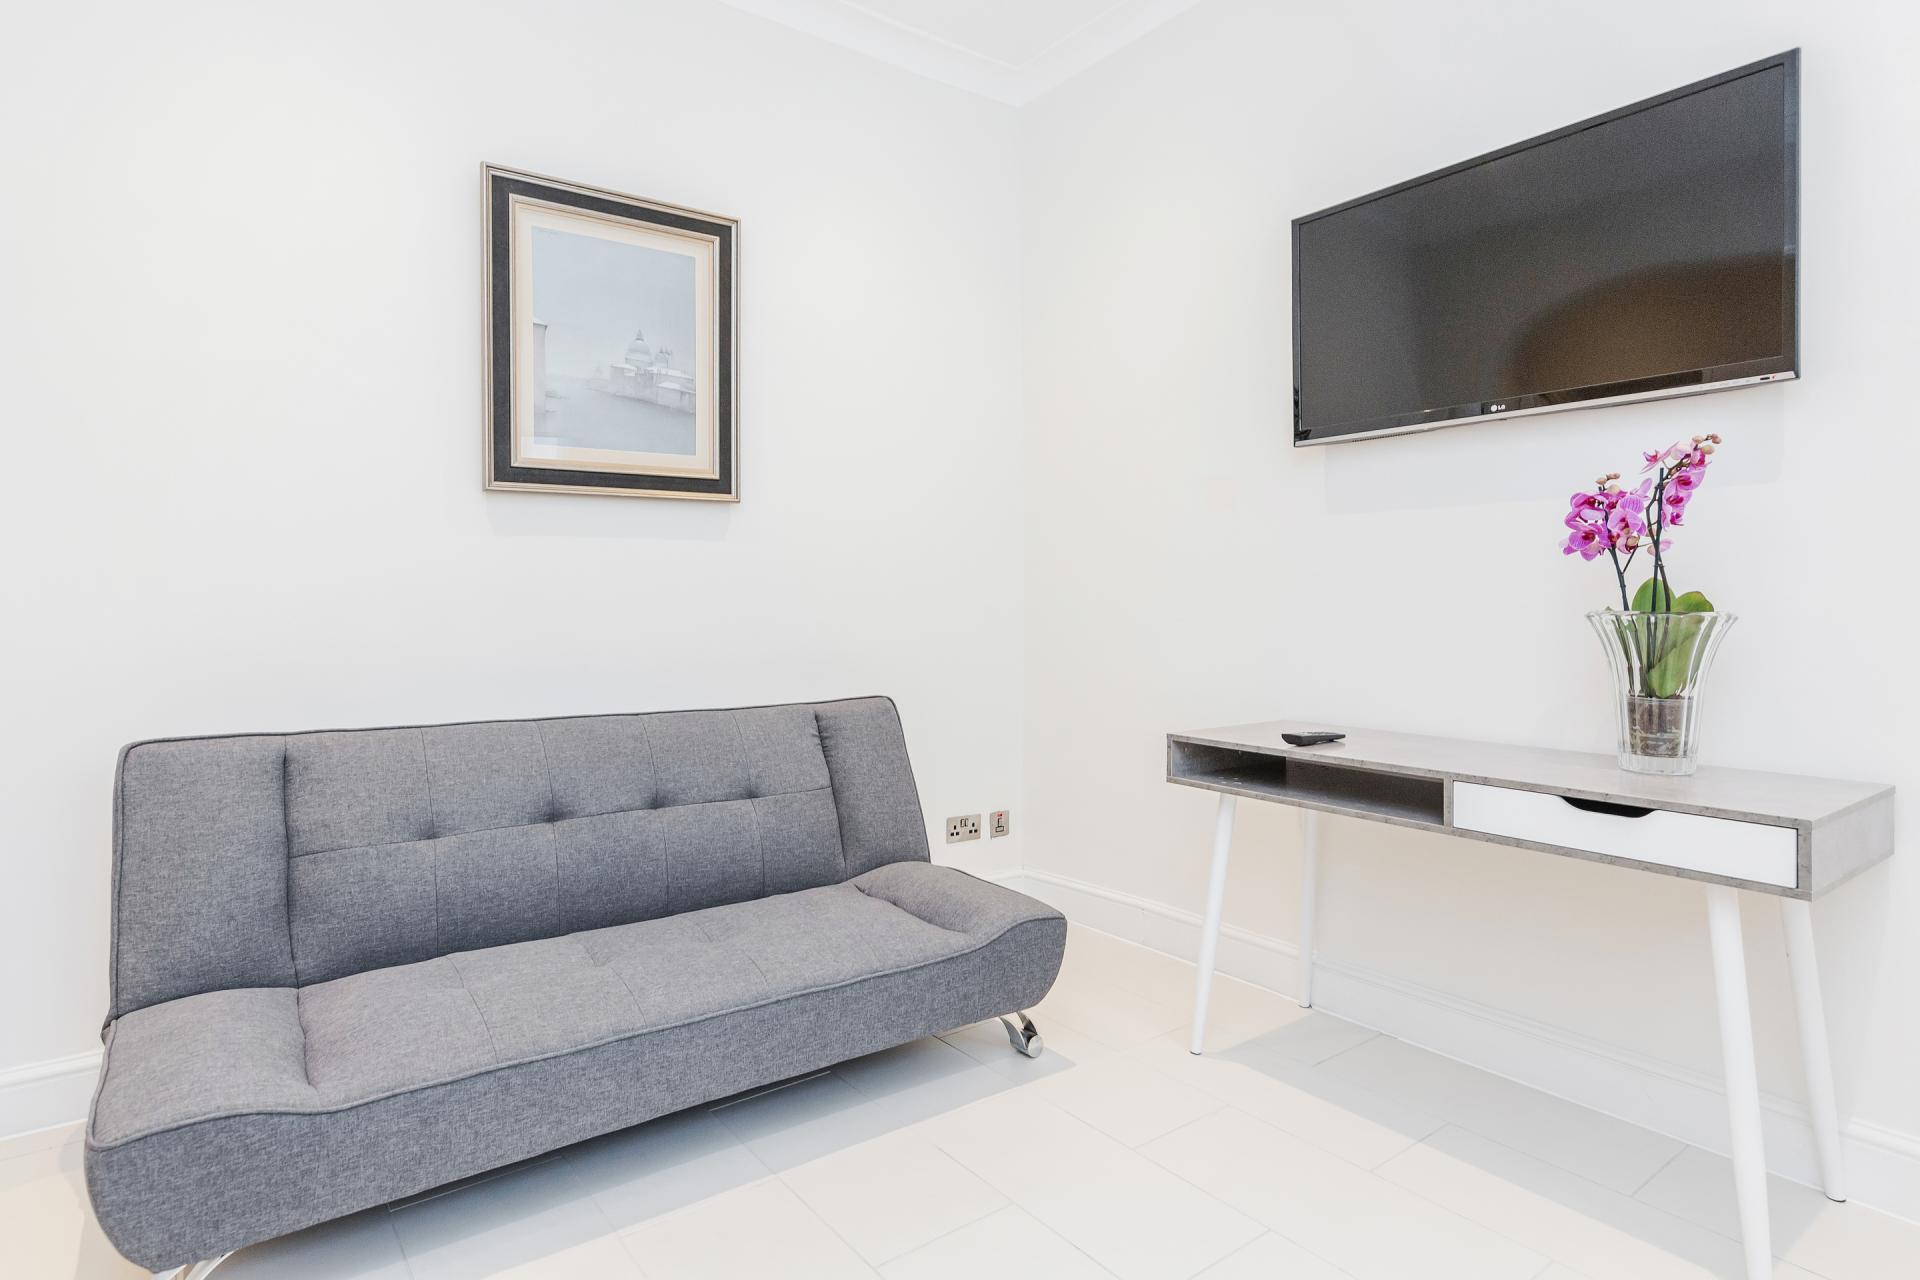 Couch at Mayfair House, Mayfair, London